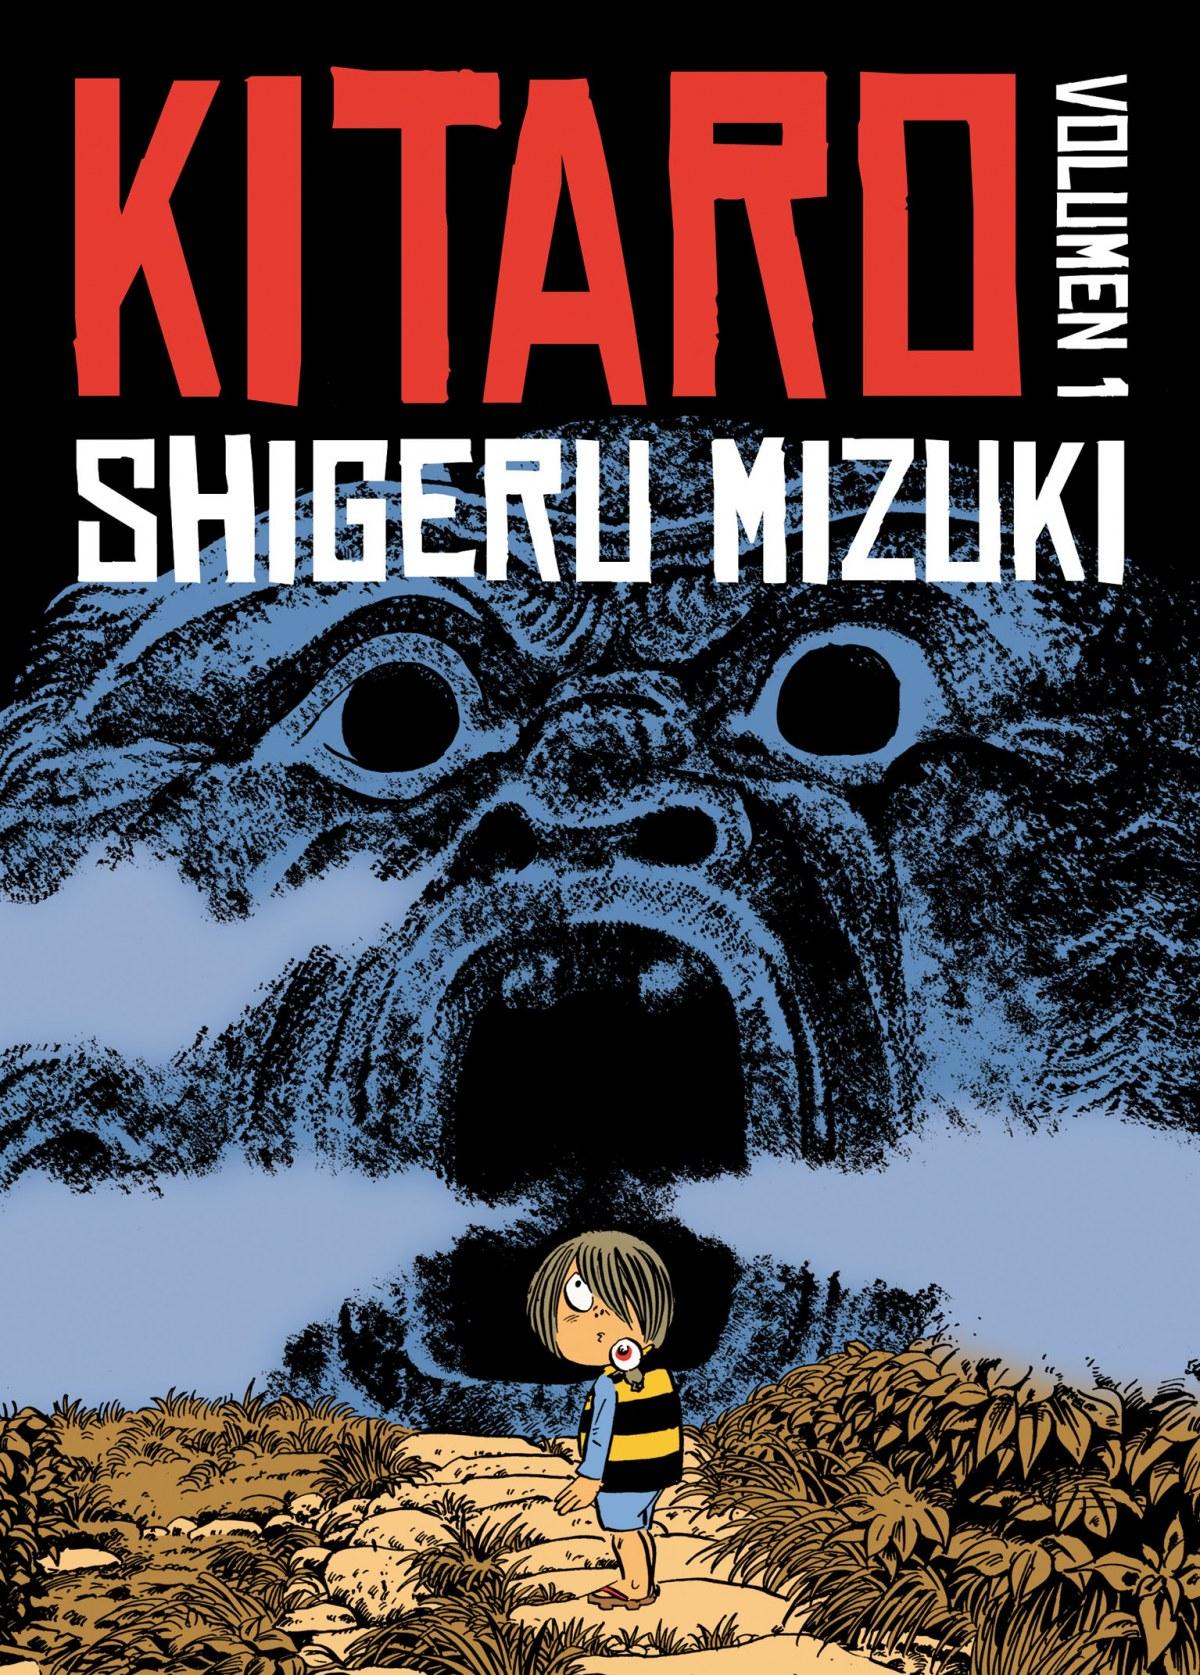 Kitaro, 1